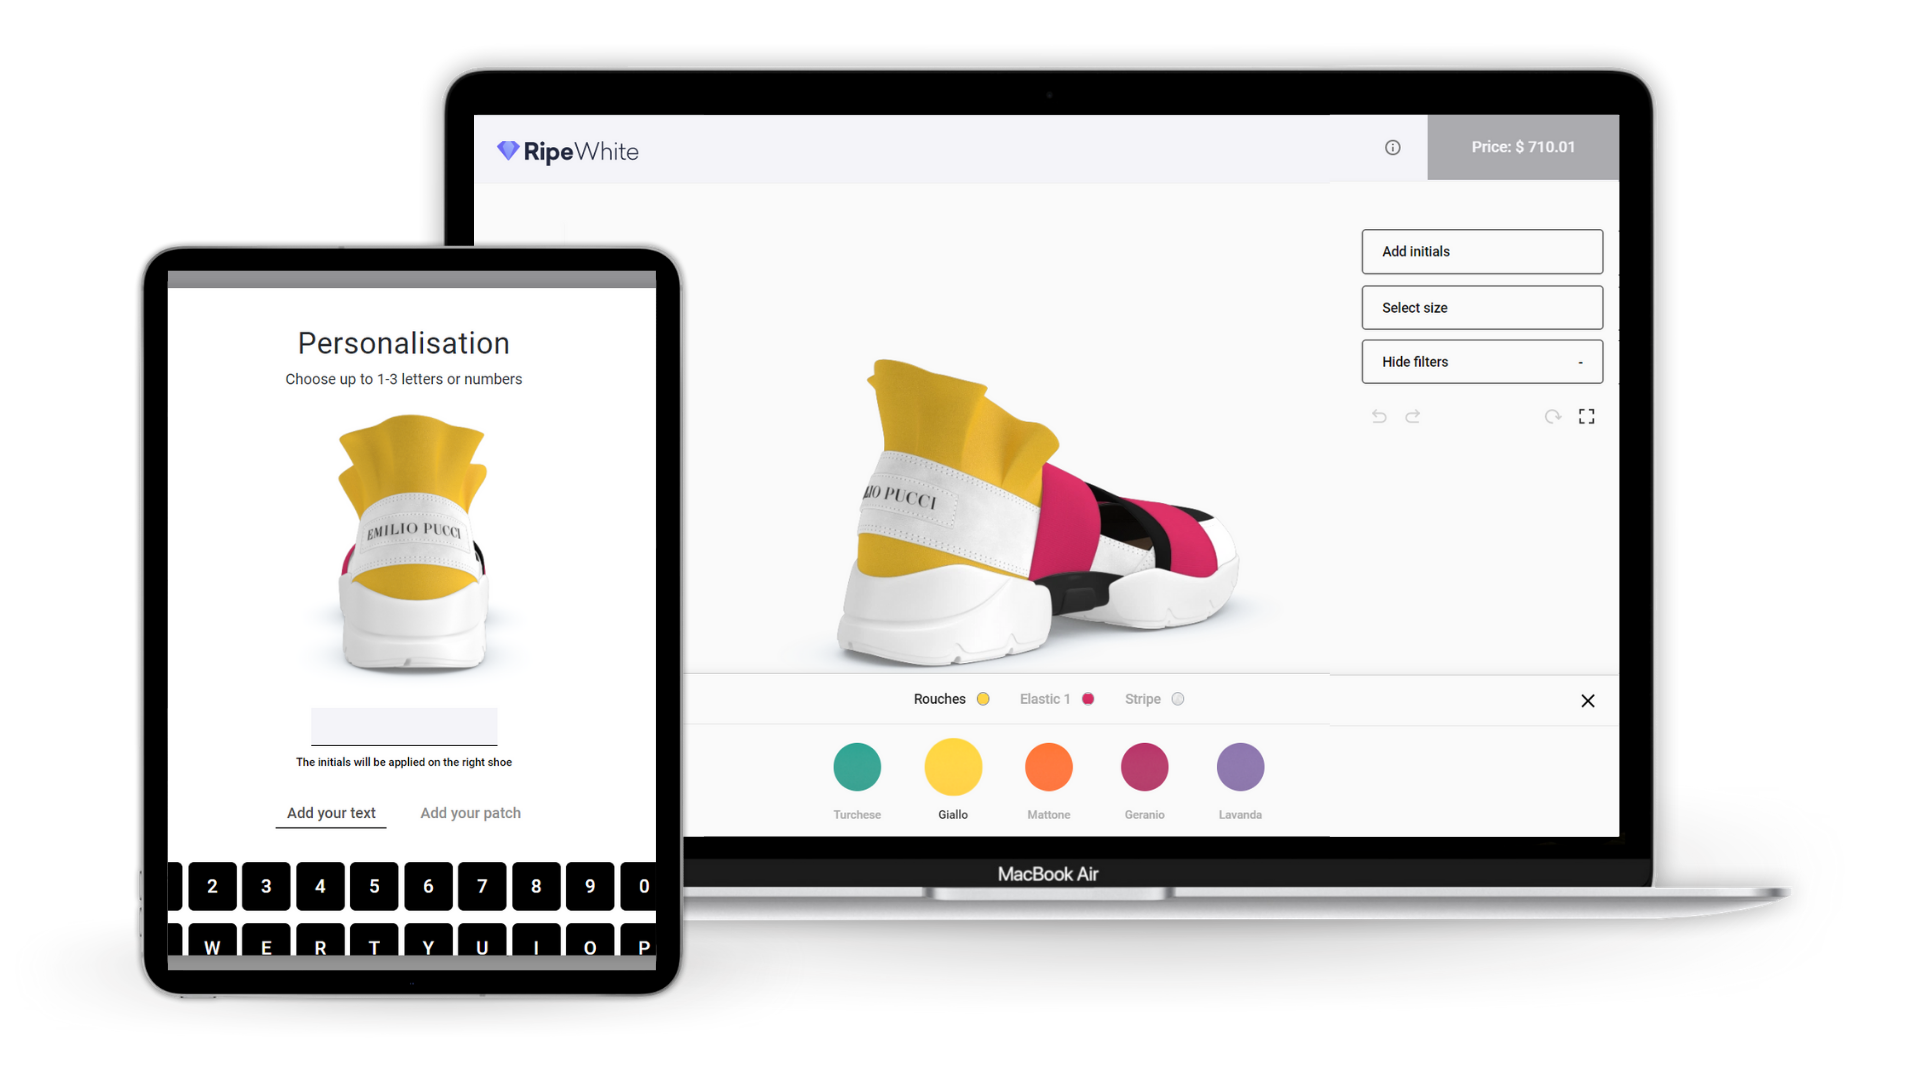 PlatformE RIPE White Product Configurator technology platform